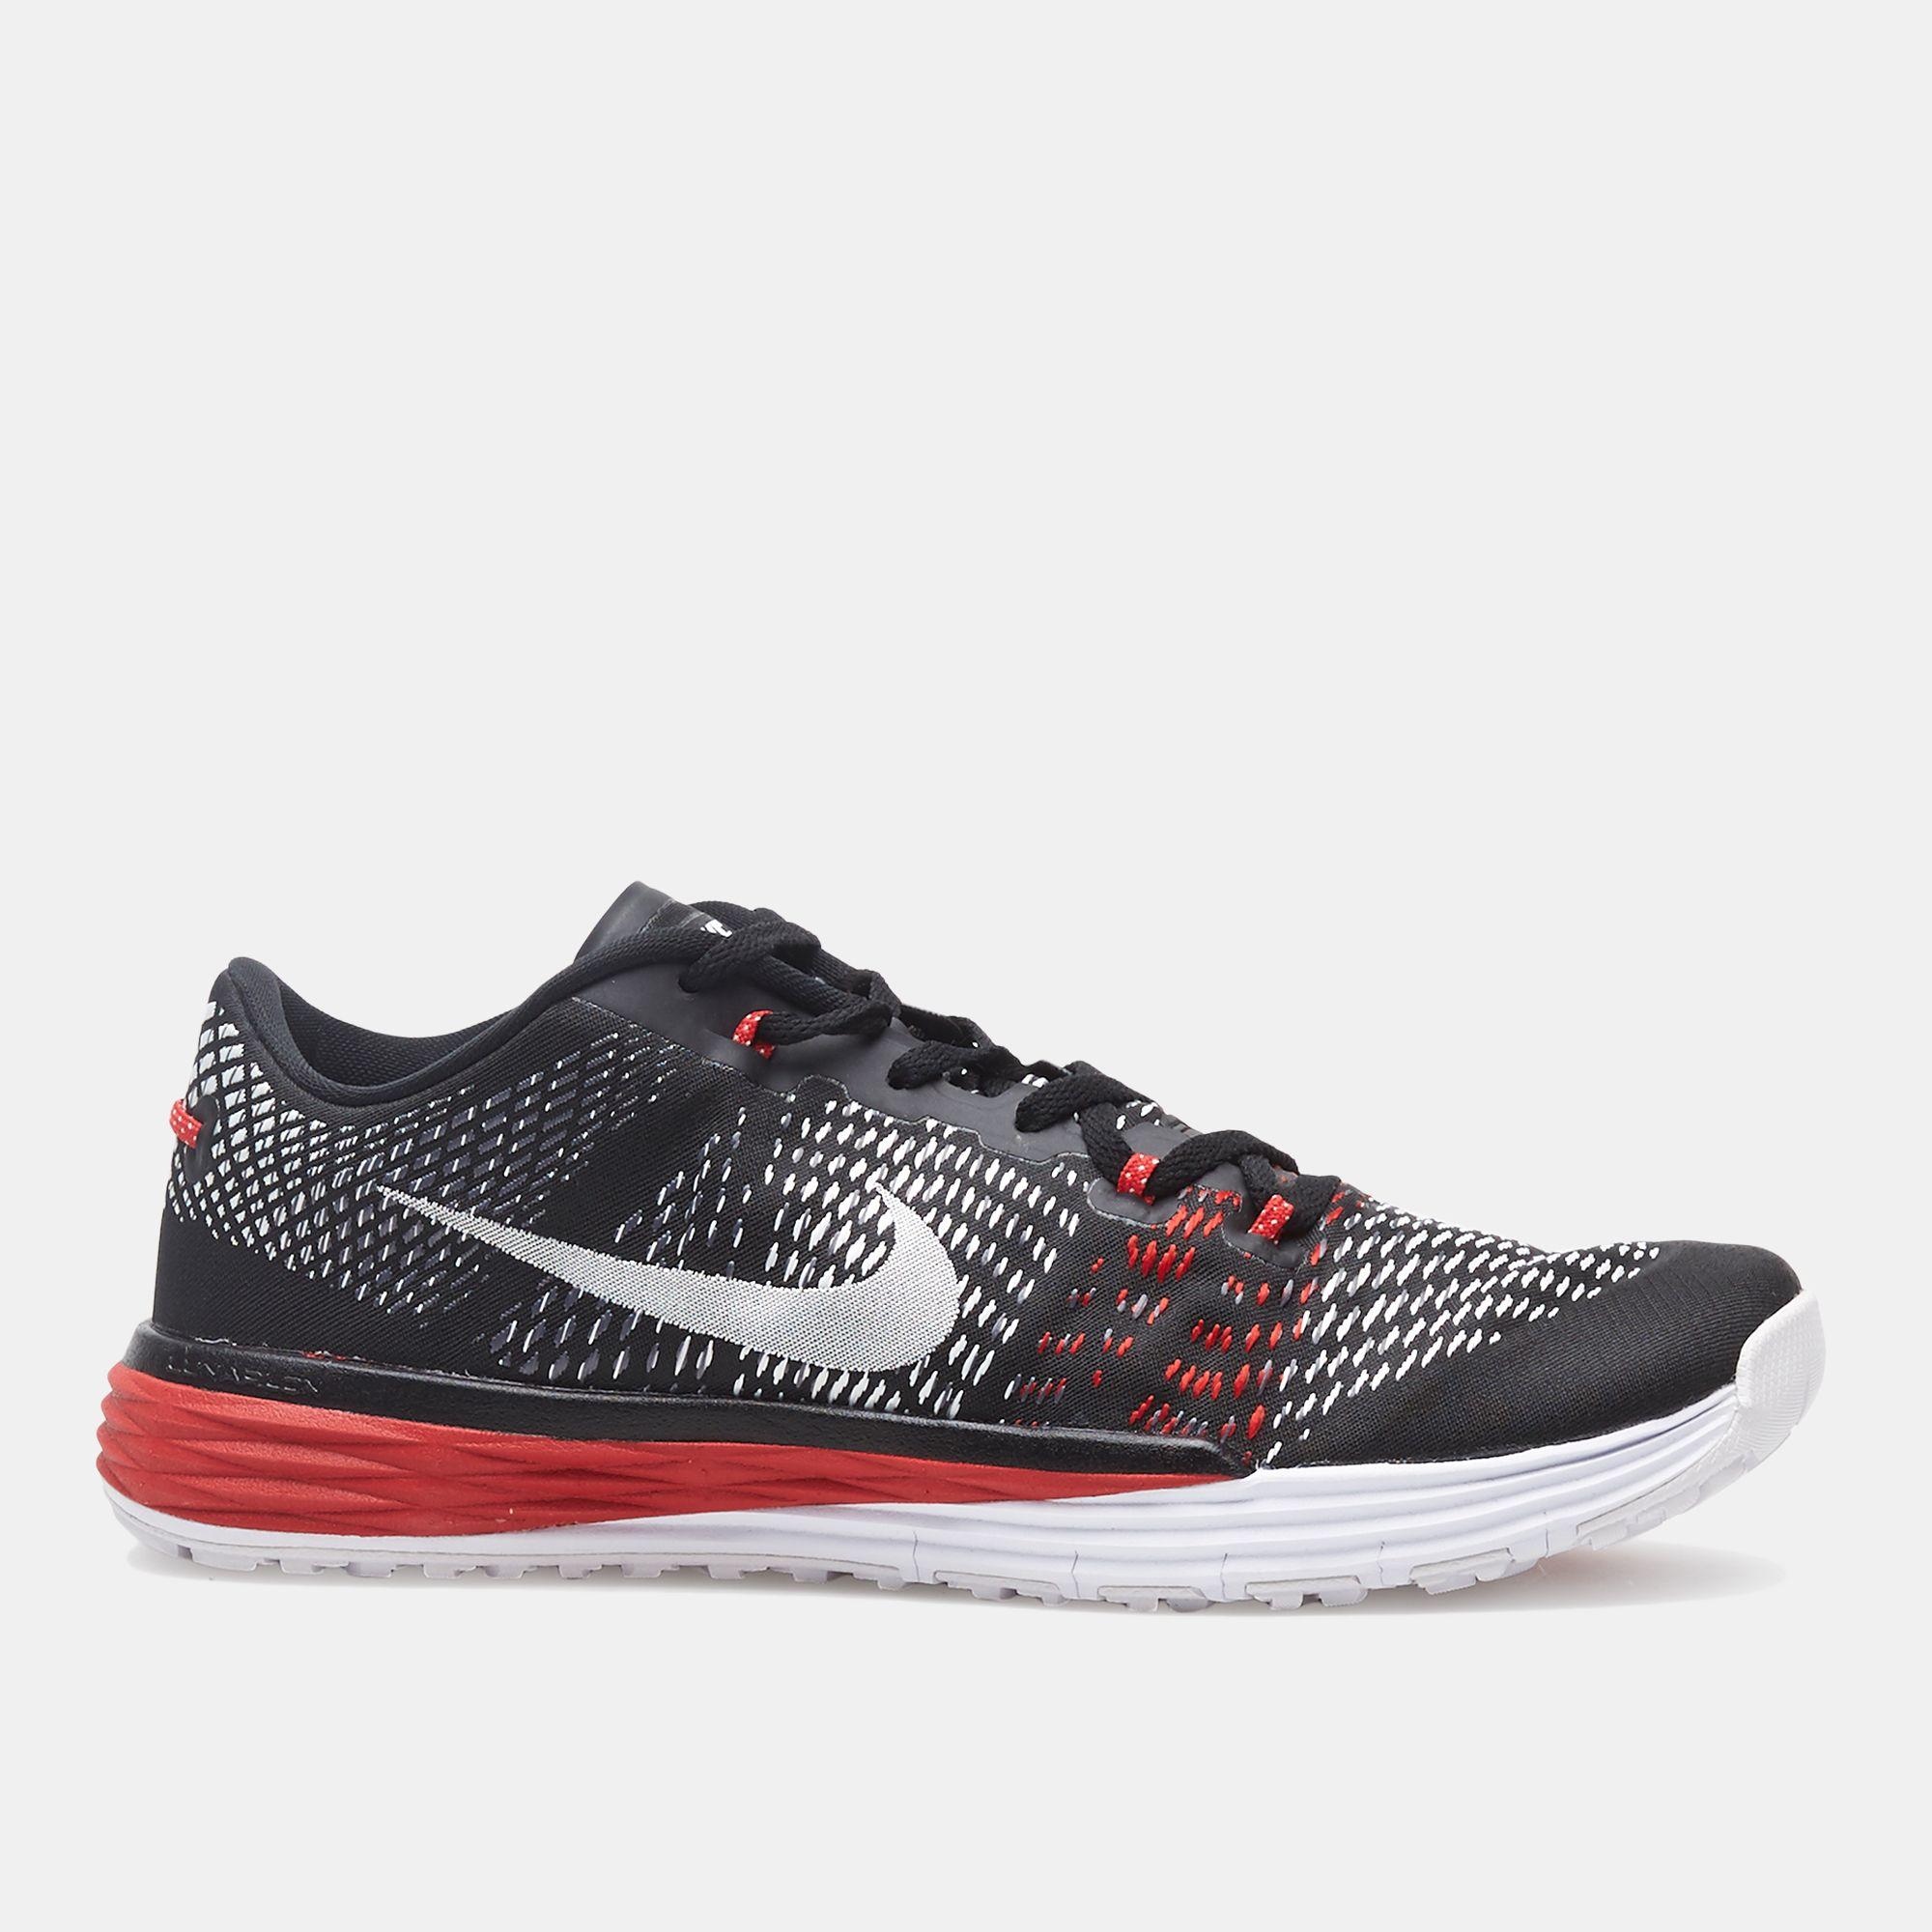 online retailer 61e38 95b27 Shop Black Nike Lunar TR1 V3 Shoe for Mens by Nike   SSS